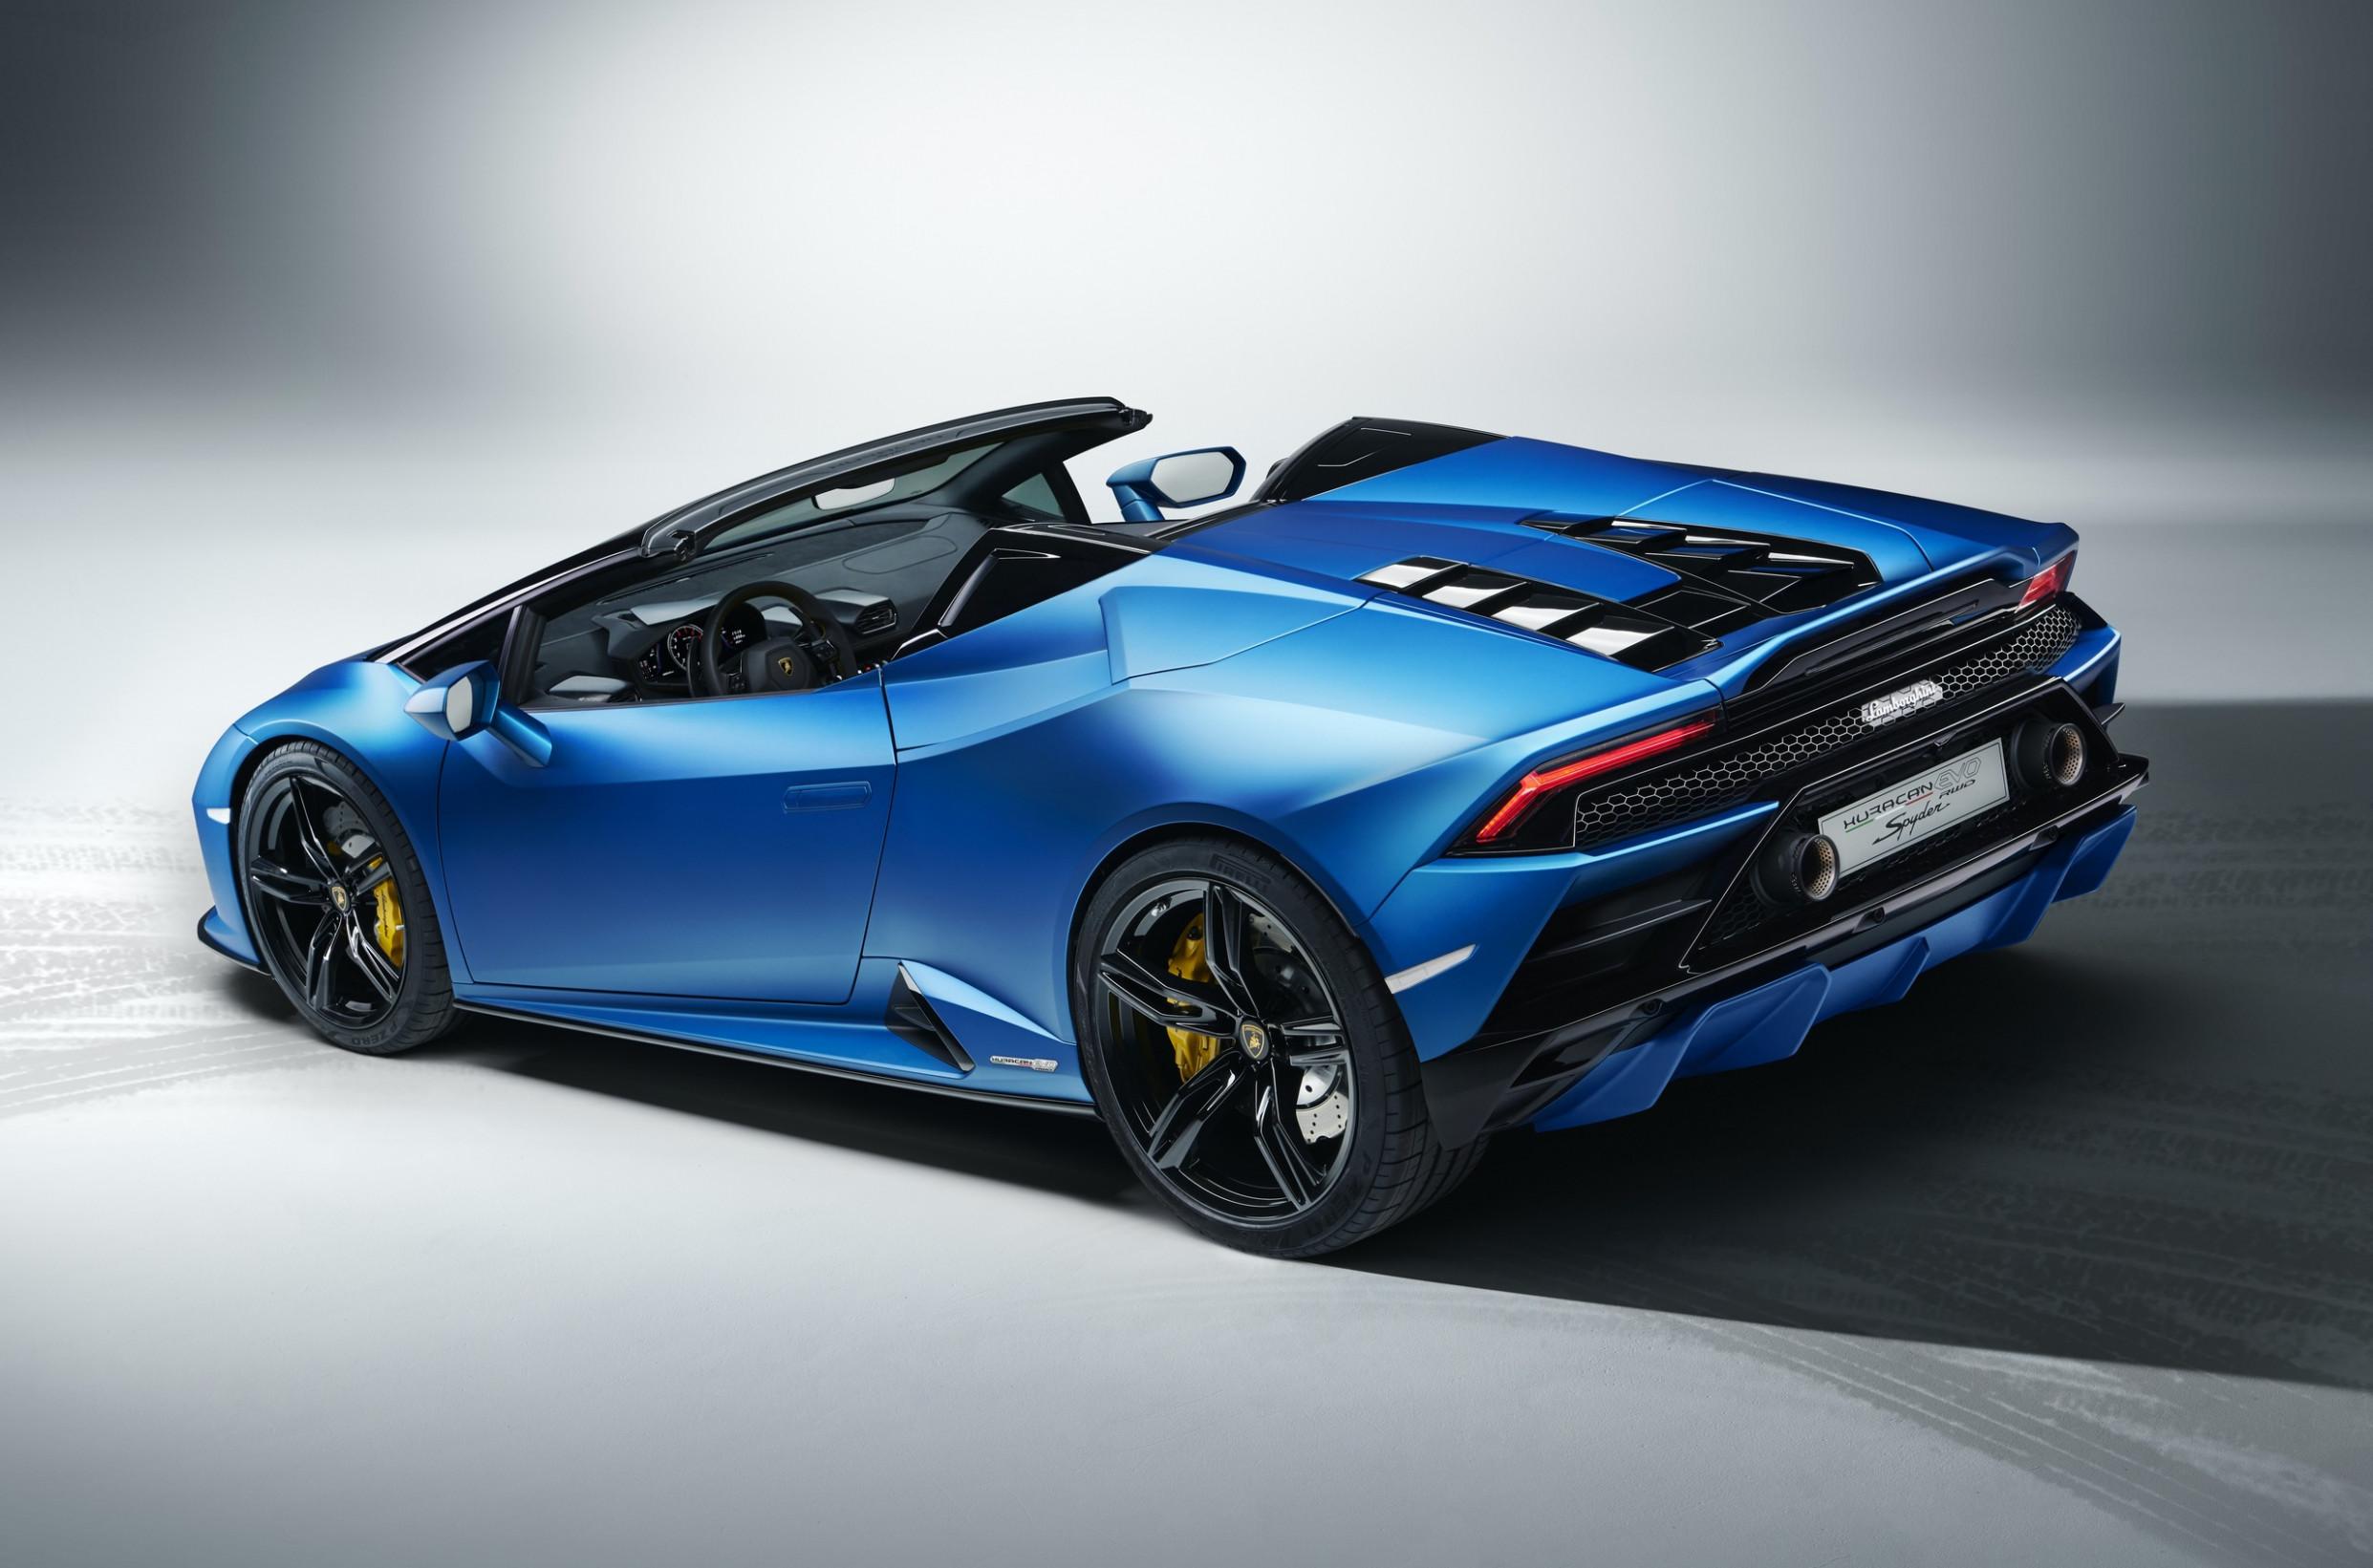 Rumors 2022 Lamborghini Huracan